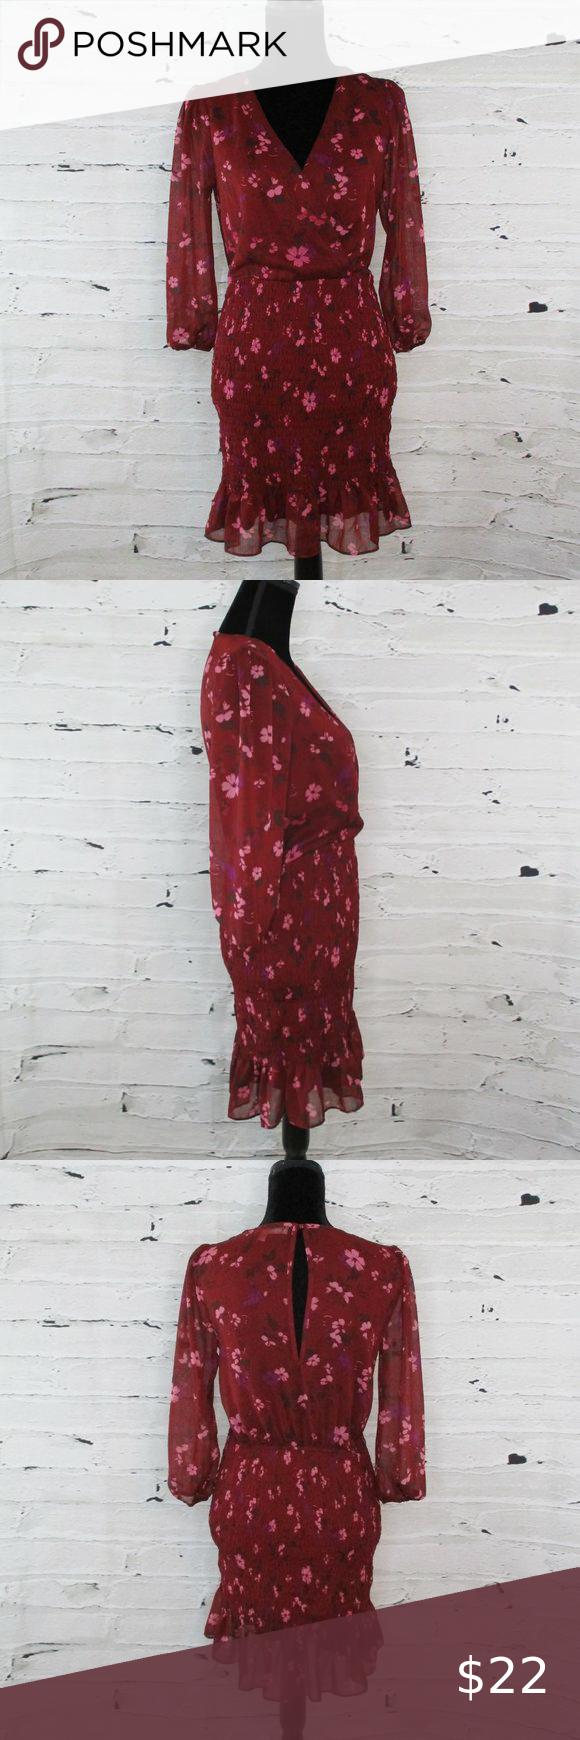 Row A Smocked Long Sleeve Chiffon Mini Dress In 2021 Chiffon Mini Dress Chiffon Long Sleeve Mini Dress [ 1740 x 580 Pixel ]